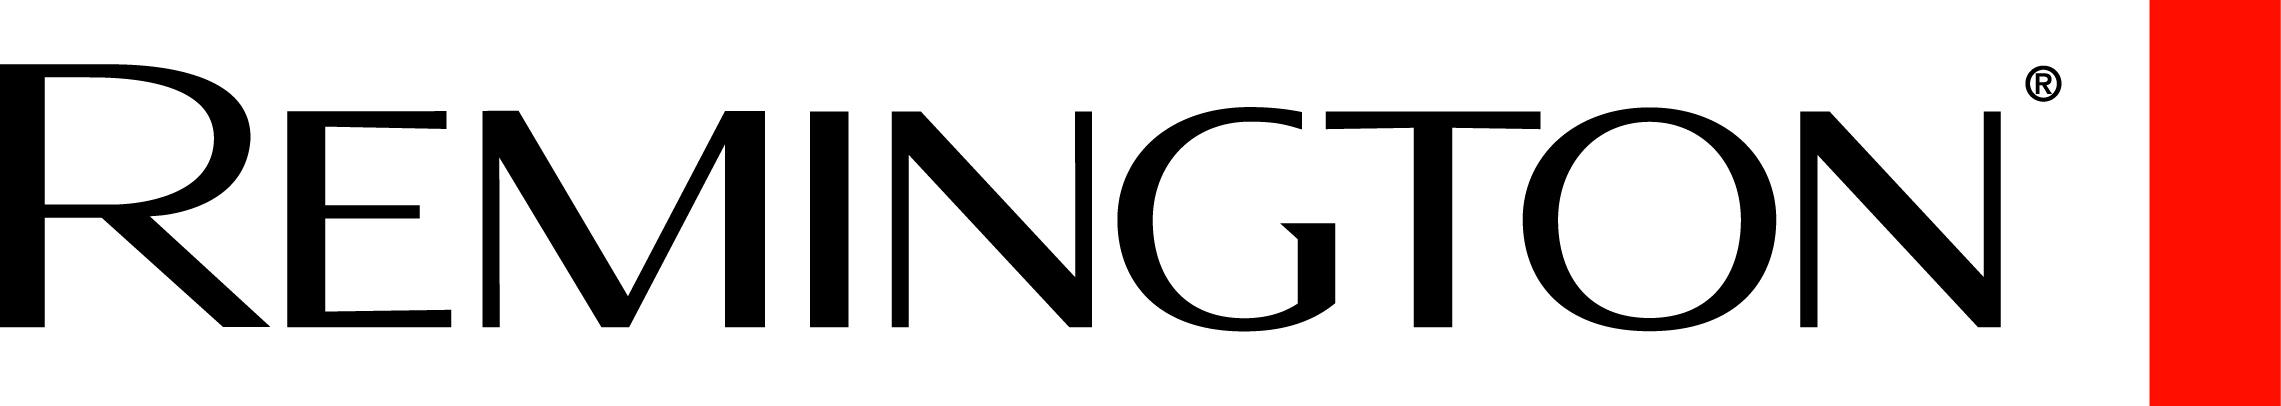 Remington Logos